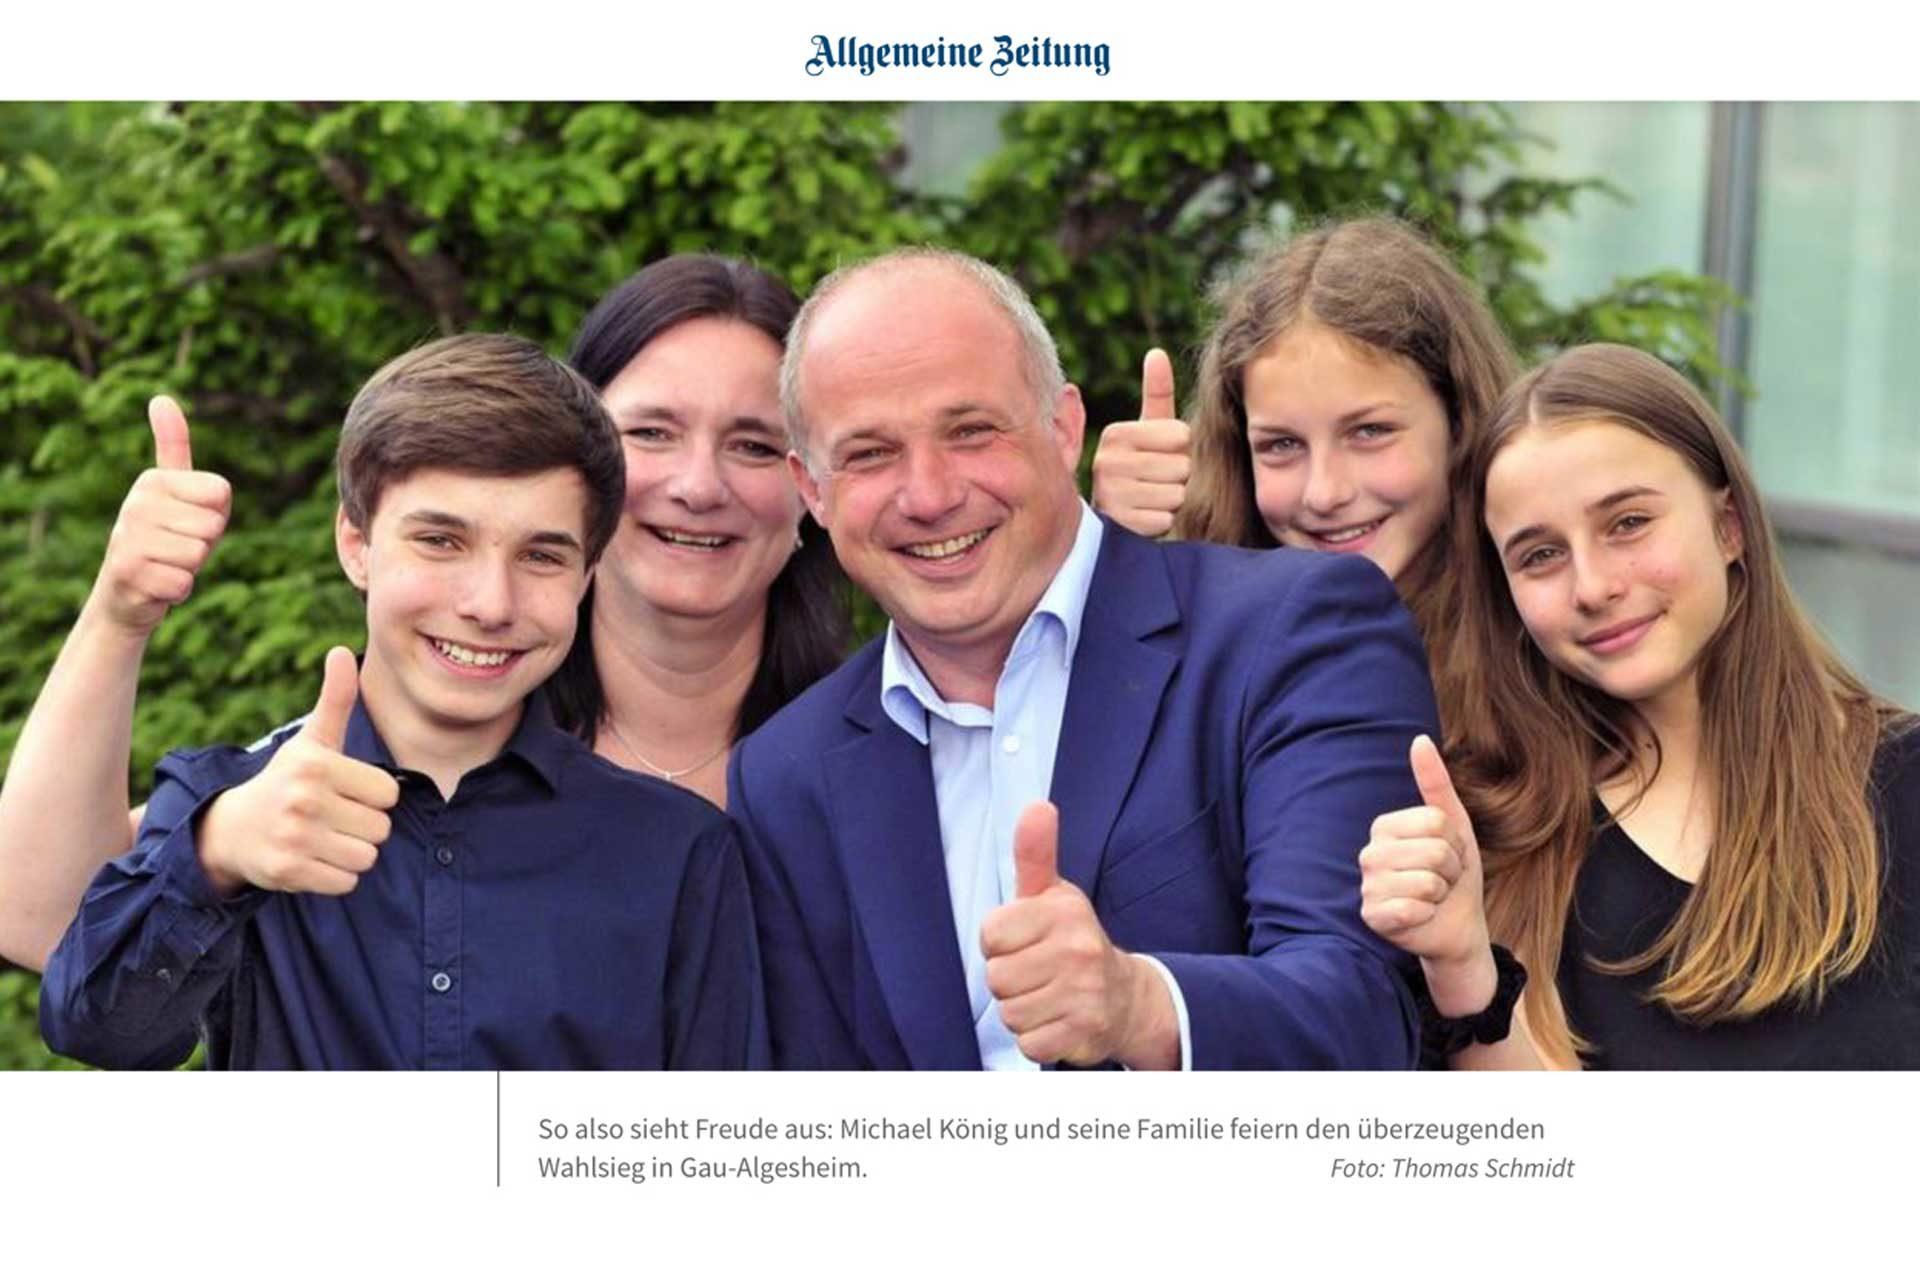 Michael König ist neuer Stadtbürgermeister